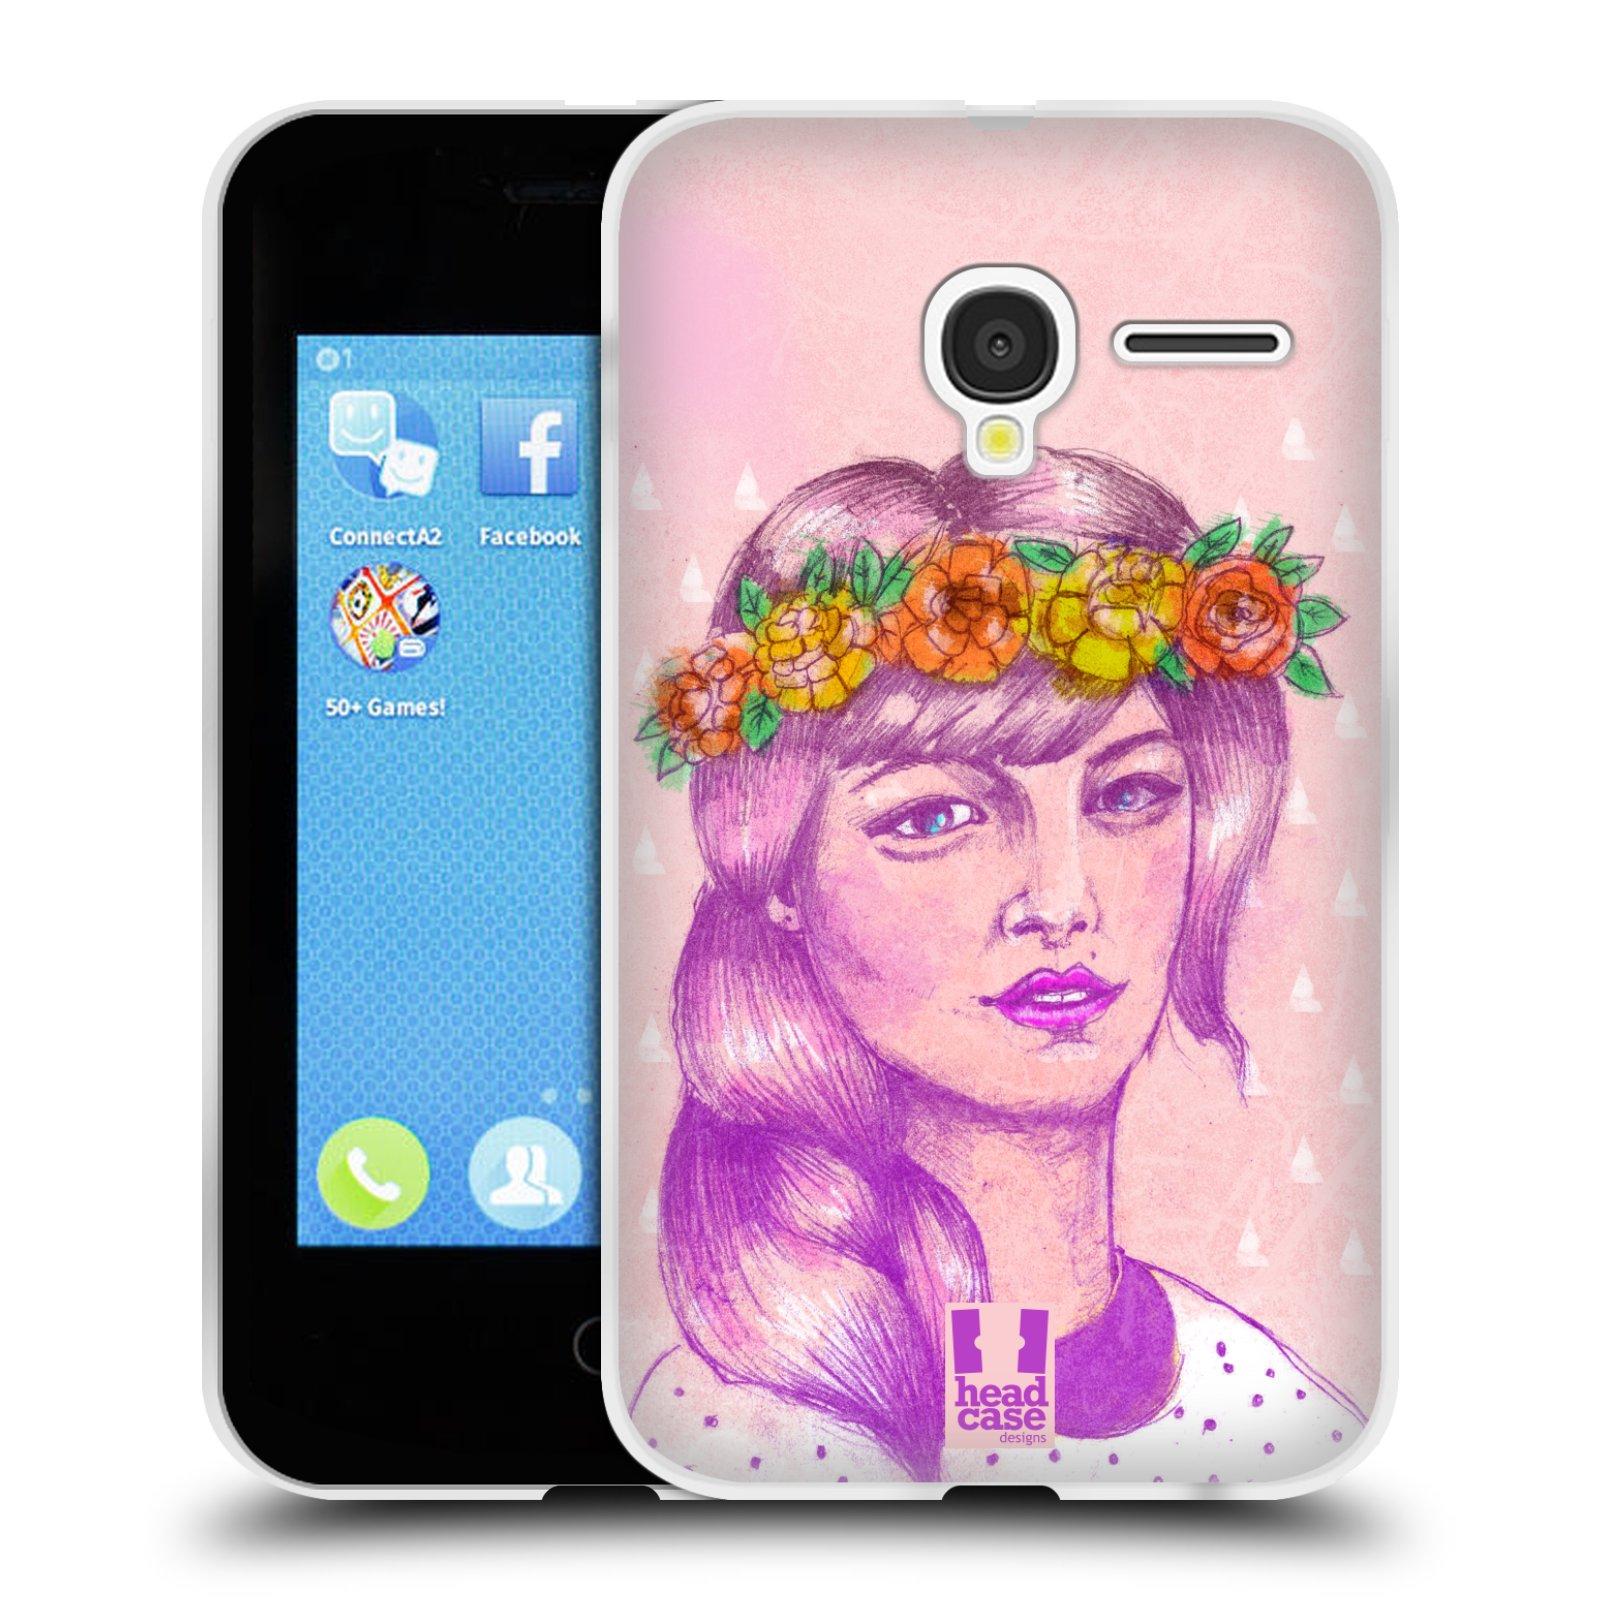 HEAD CASE silikonový obal na mobil Alcatel PIXI 3 OT-4022D (3,5 palcový displej) vzor Dívka dlouhé květinové vlasy KRÁSA